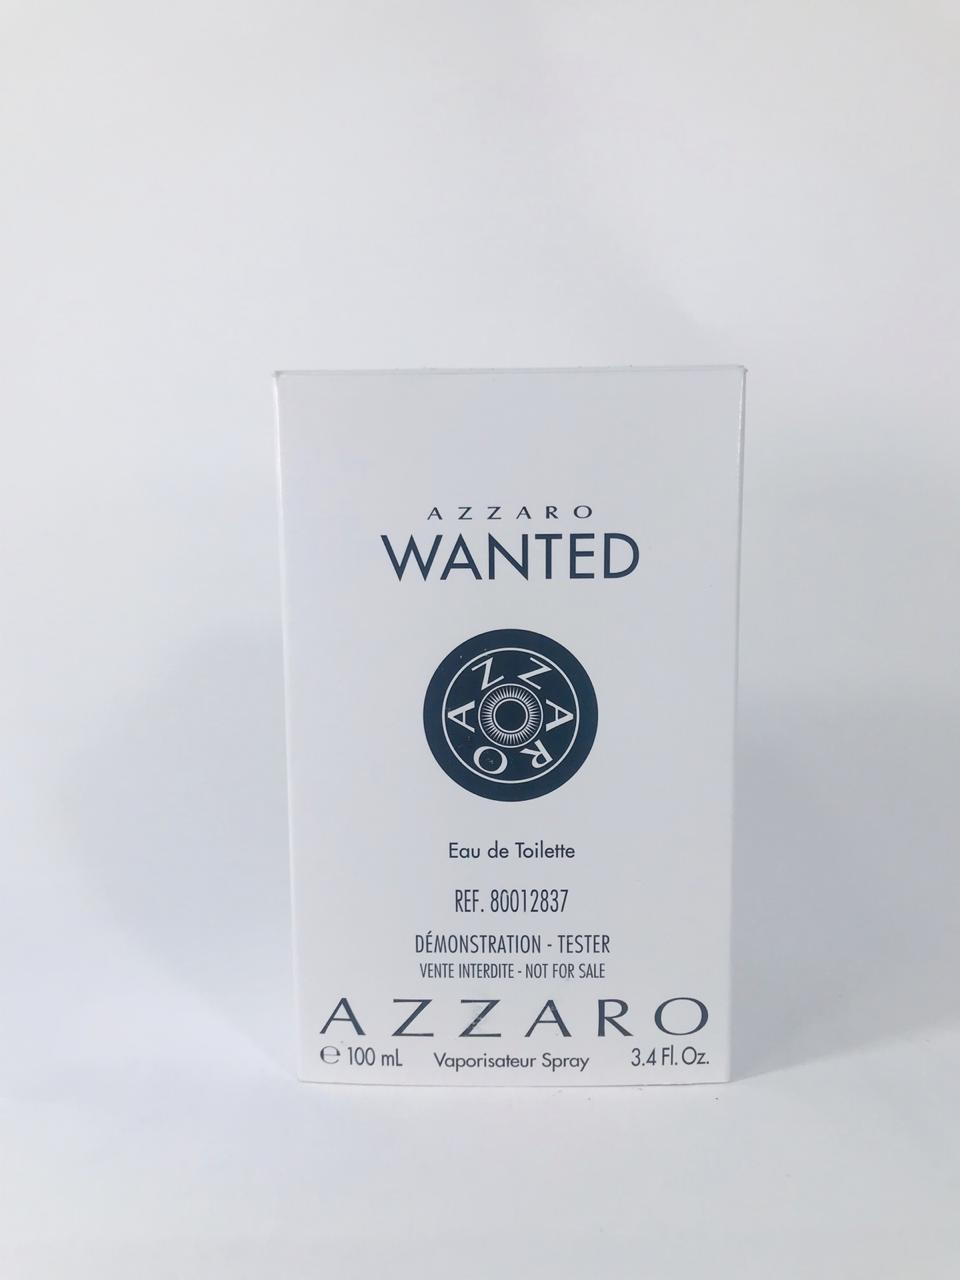 Wanted Azzaro Masculino Eau de Toilette 100 ml - Tester